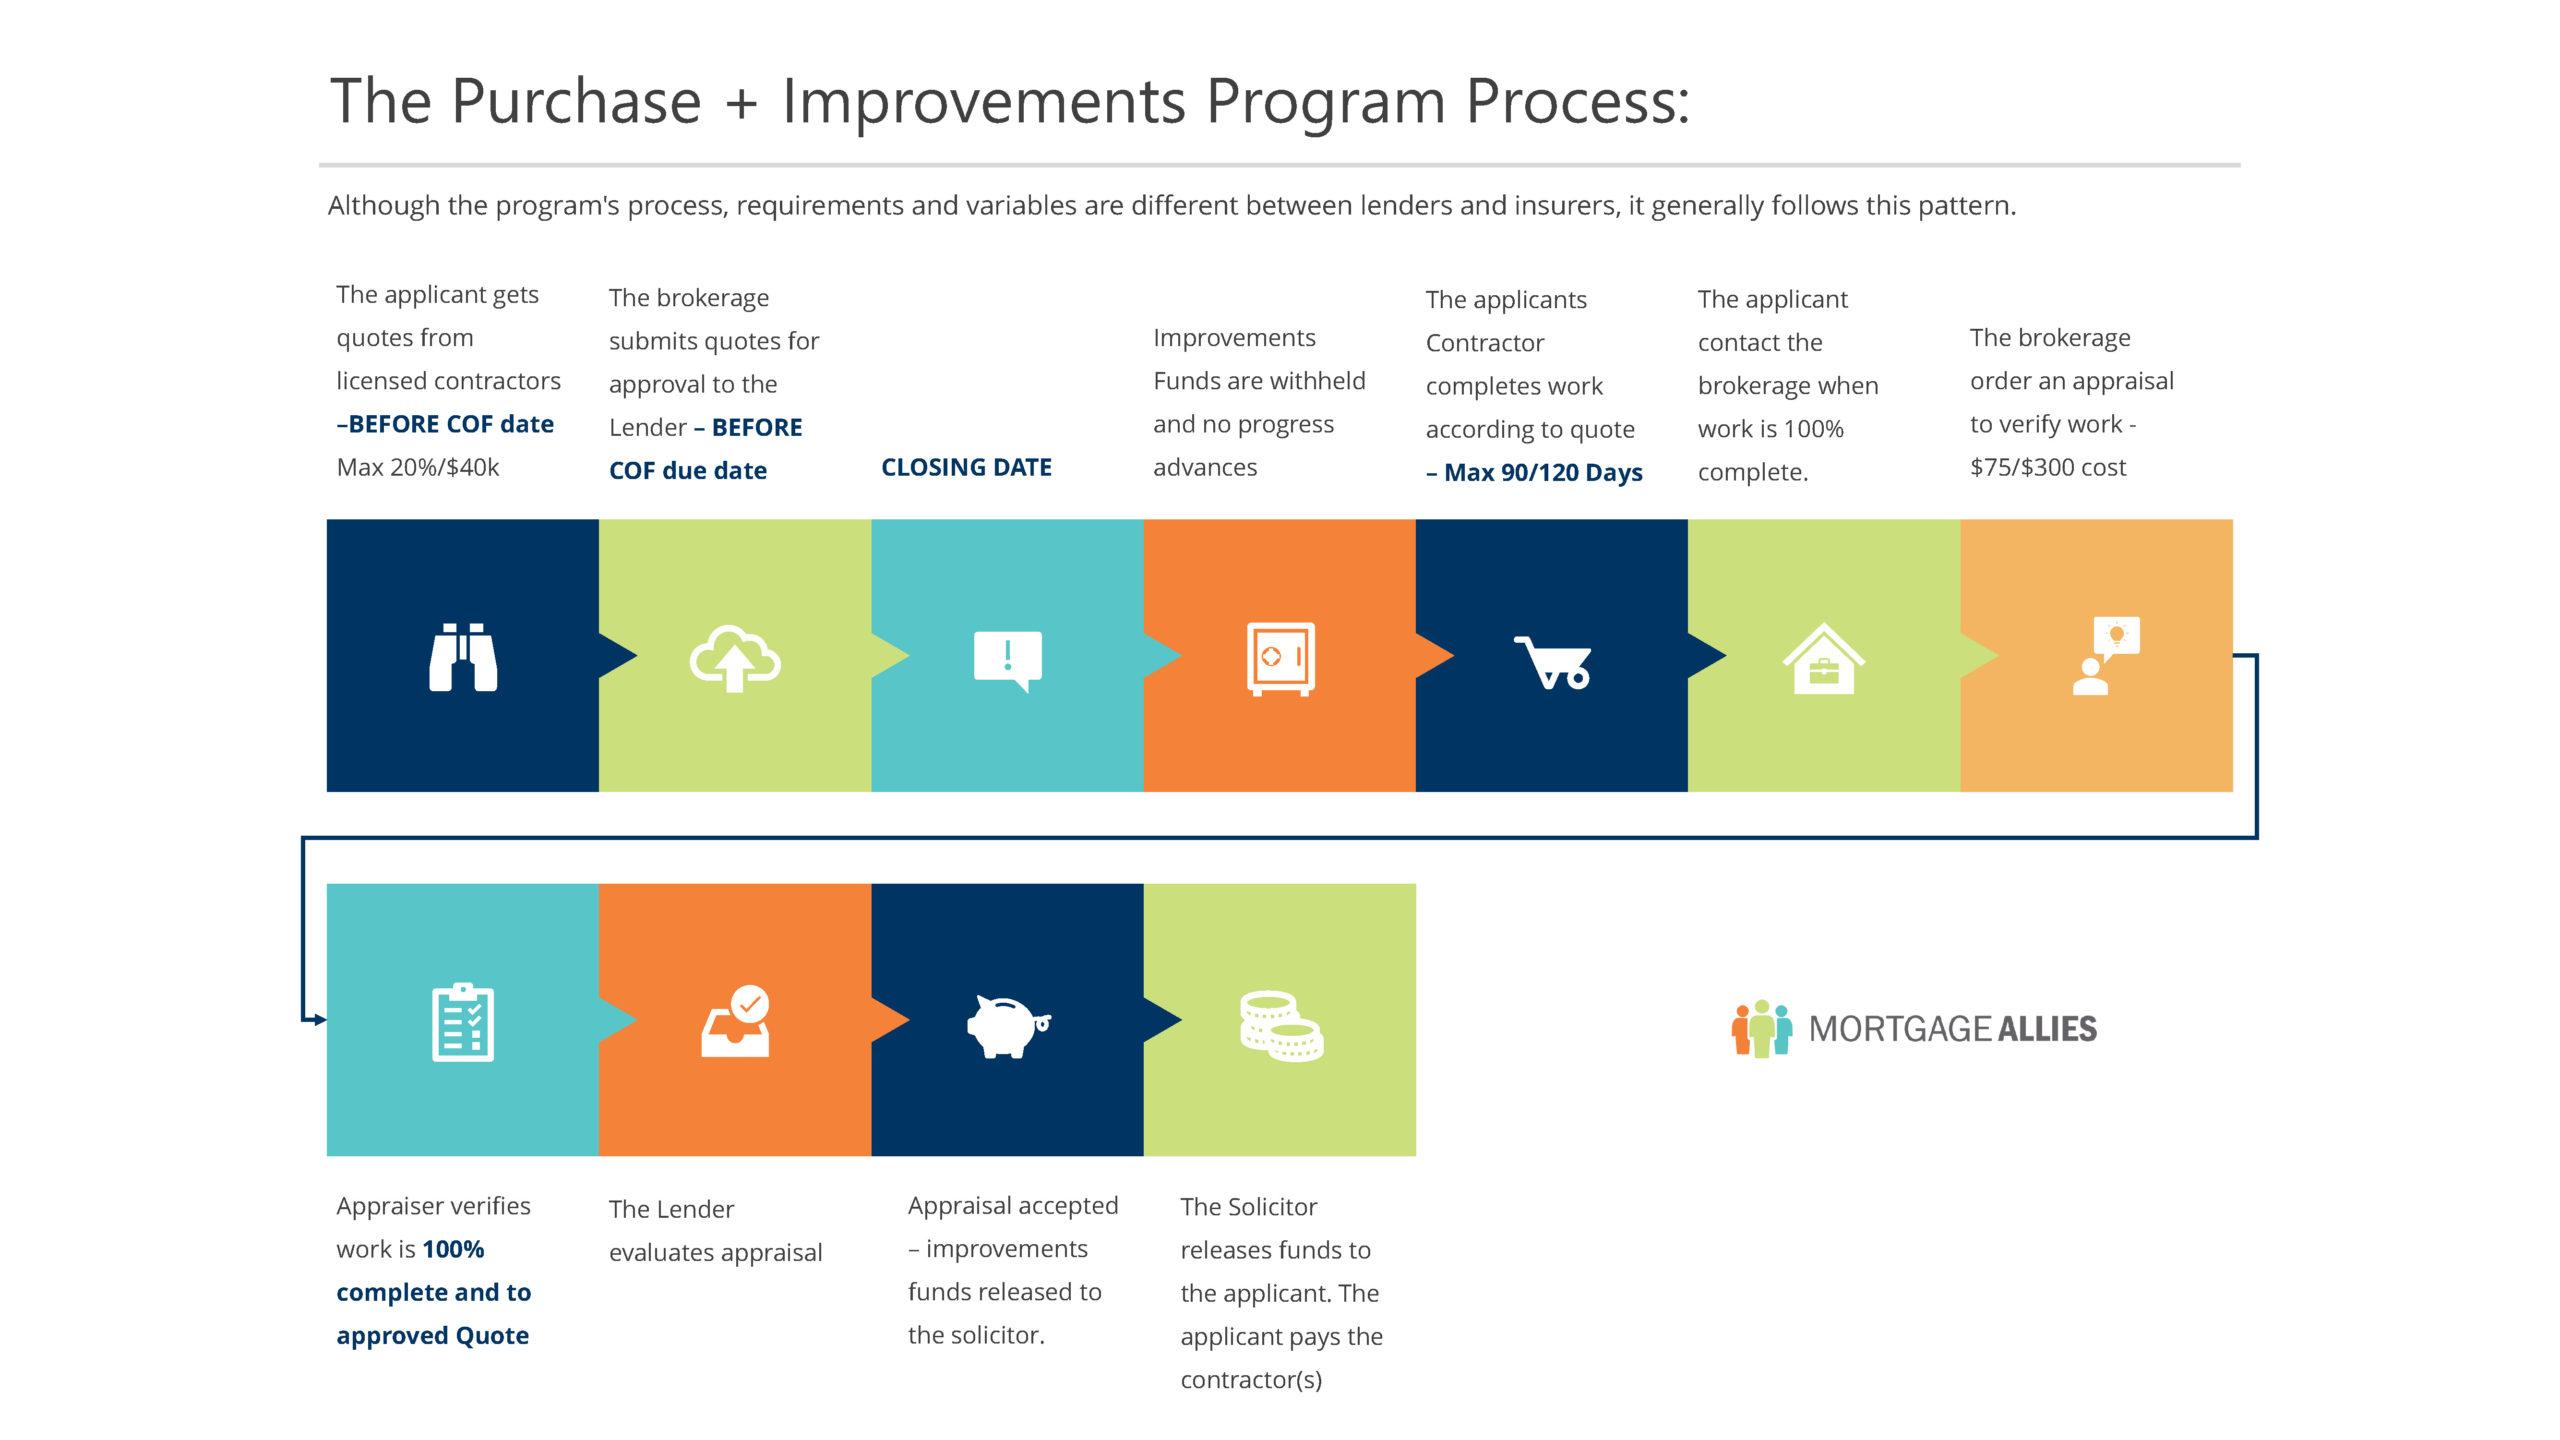 The Purchase + Improvements Program Process: